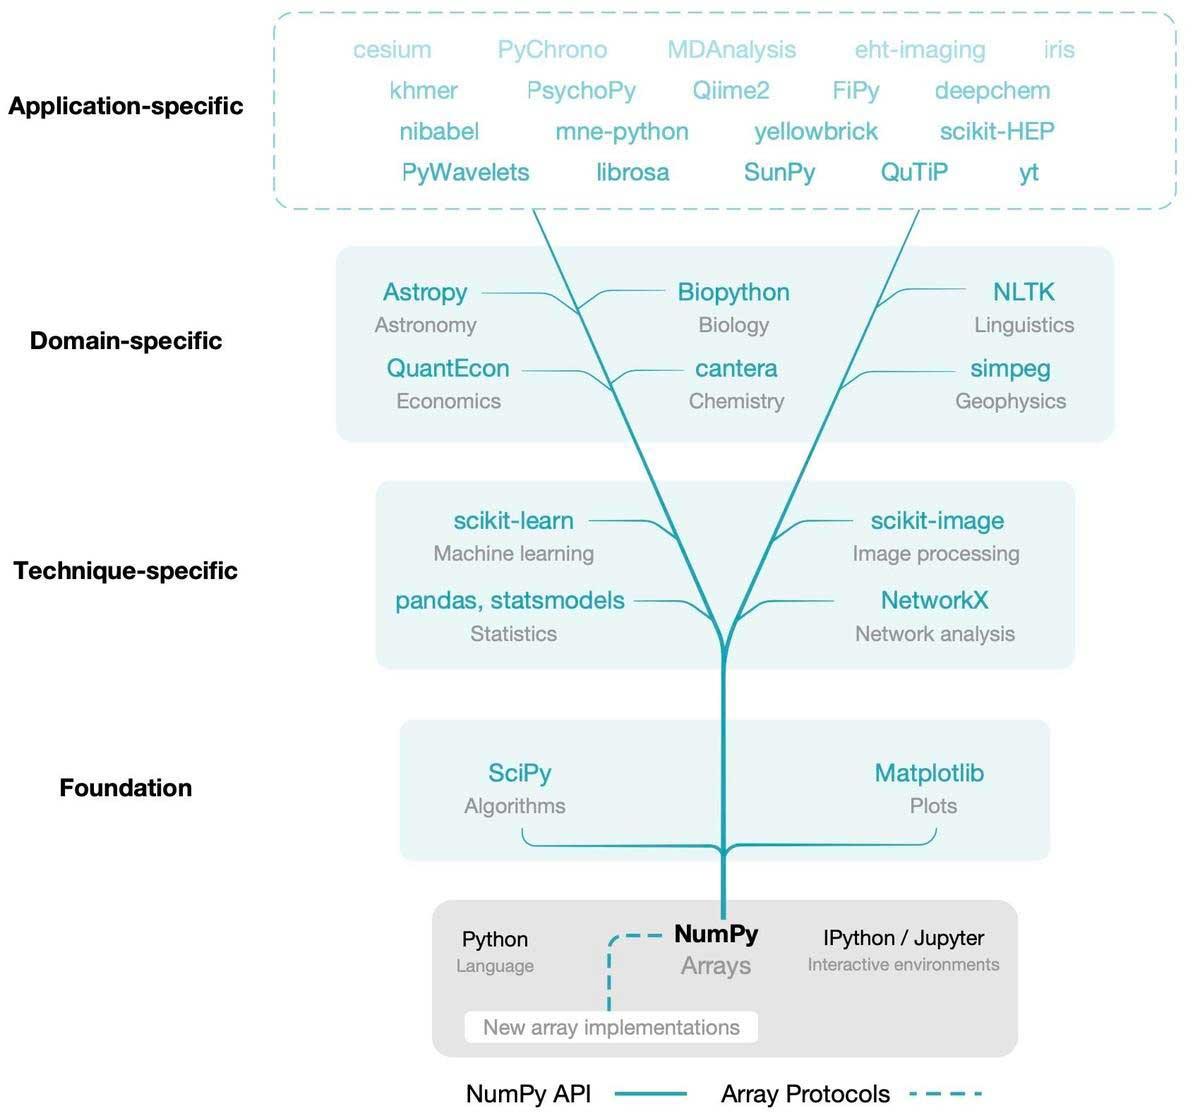 numpy-2020-tree-of-projects.jpg